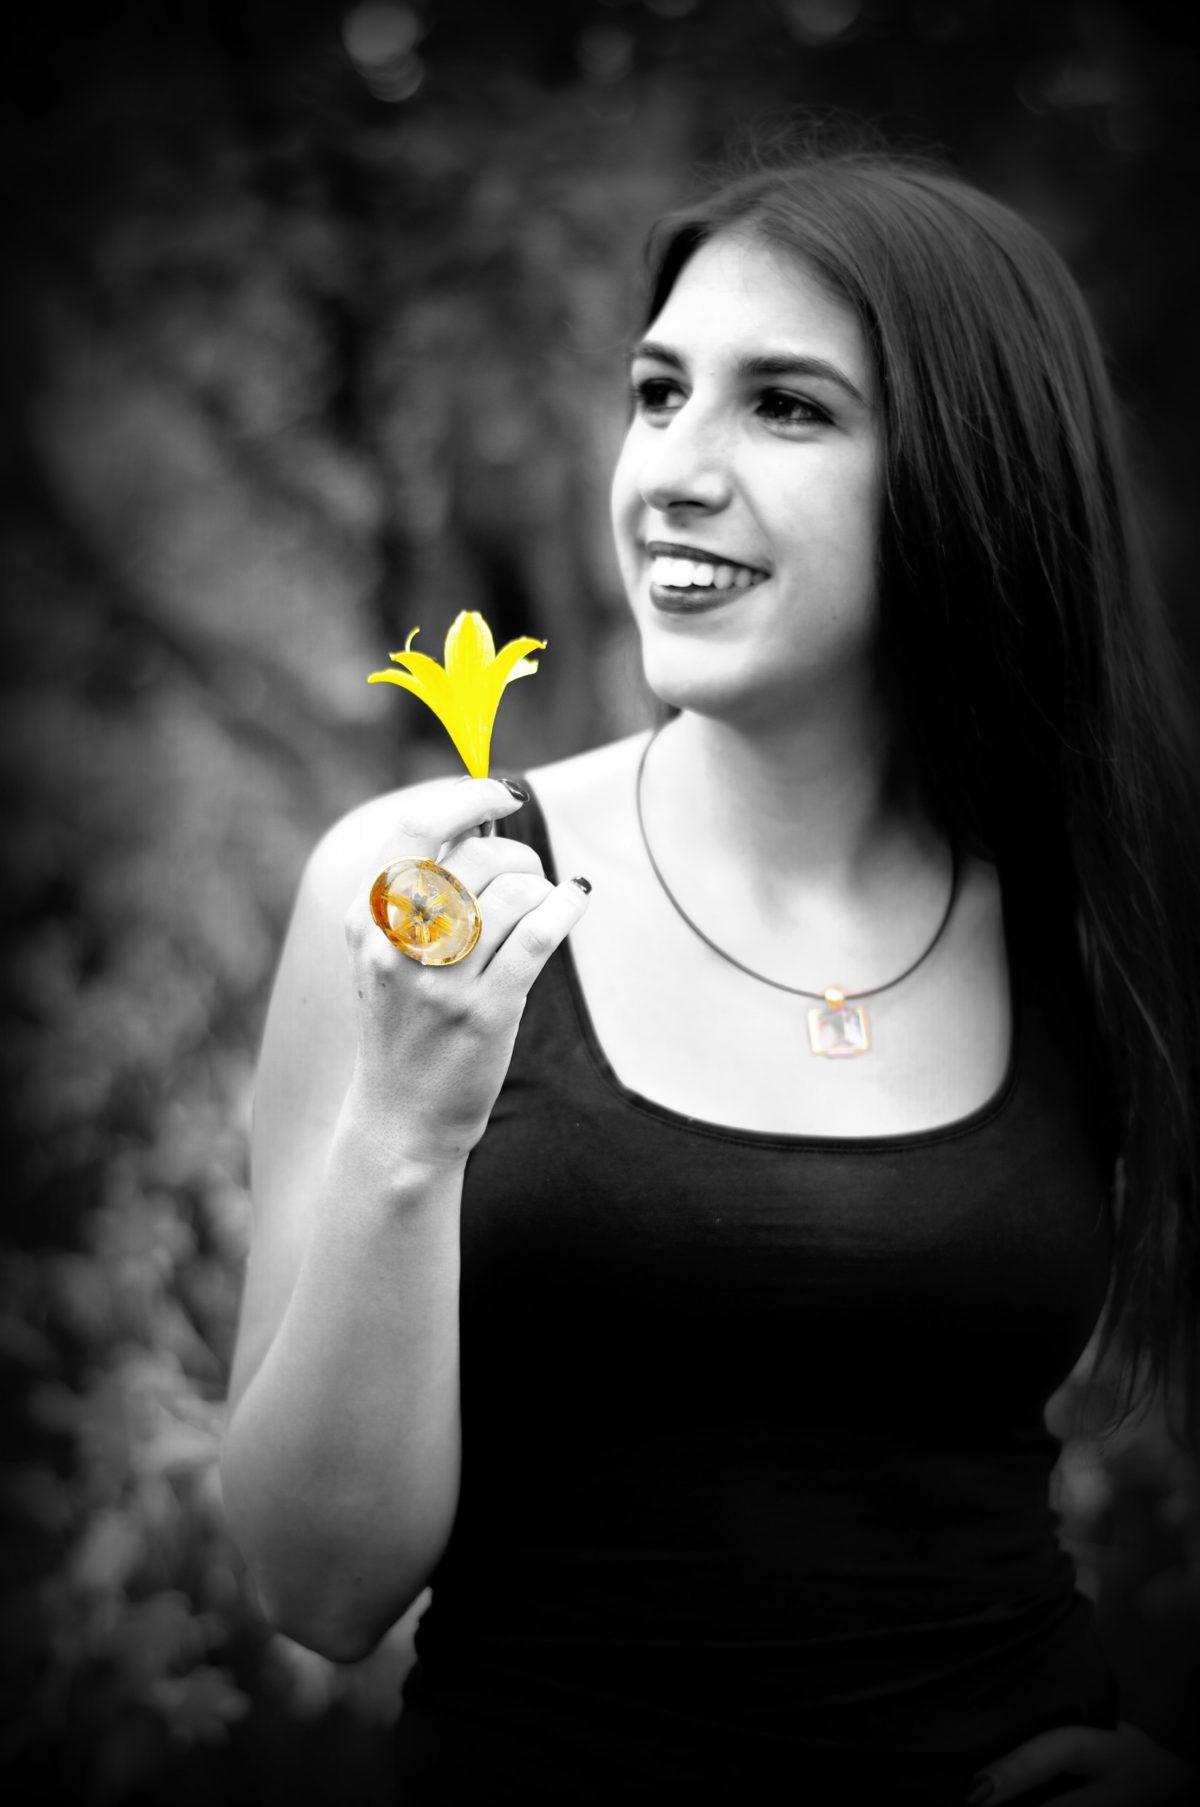 Fotomodell Ring gelbe Blume